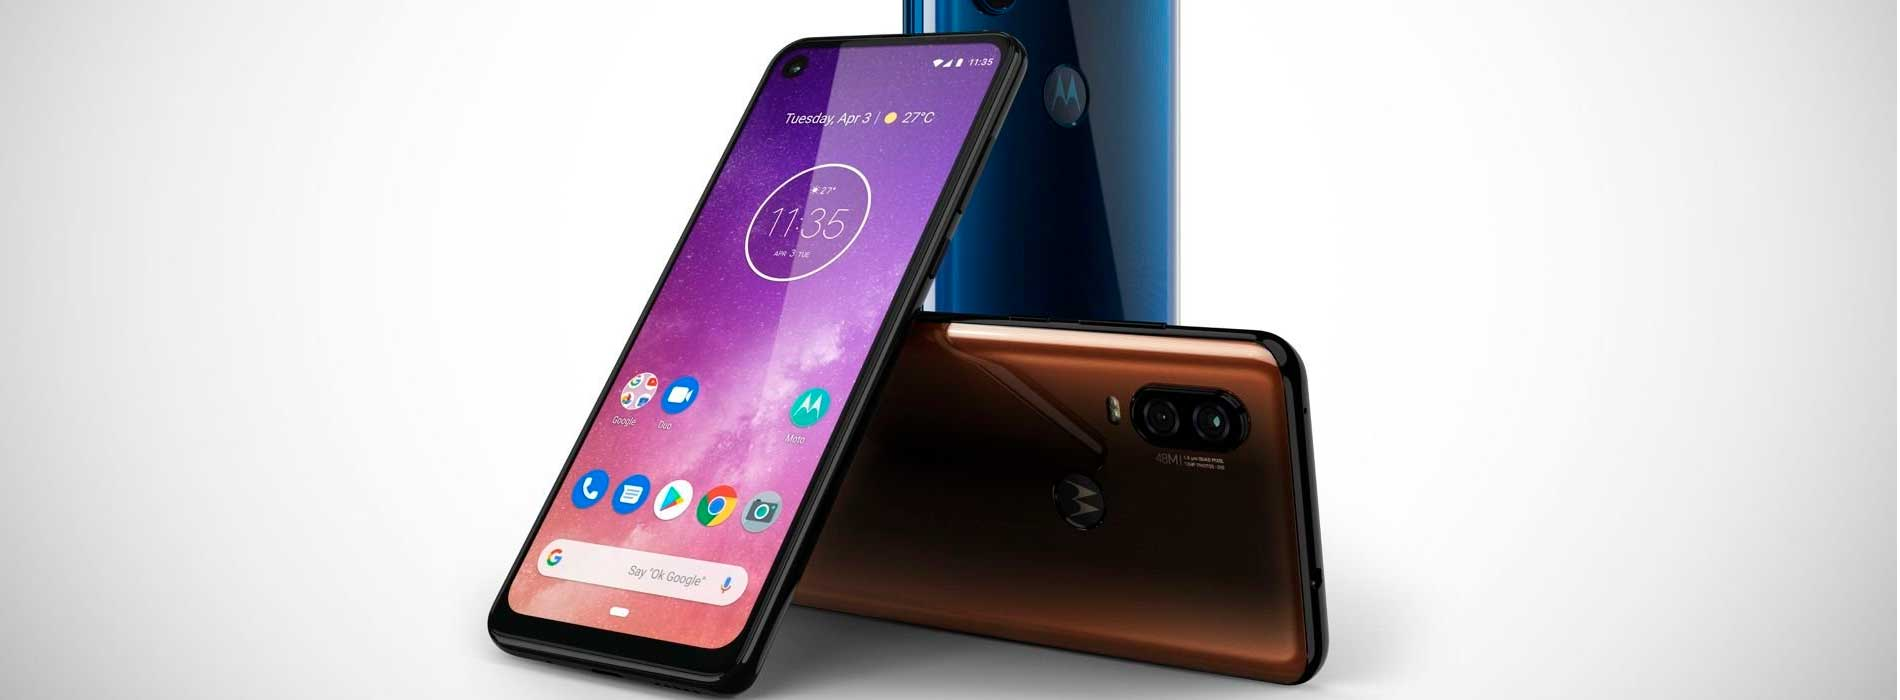 Análise: Motorola One Vision - tela alongada mostra seu potencial